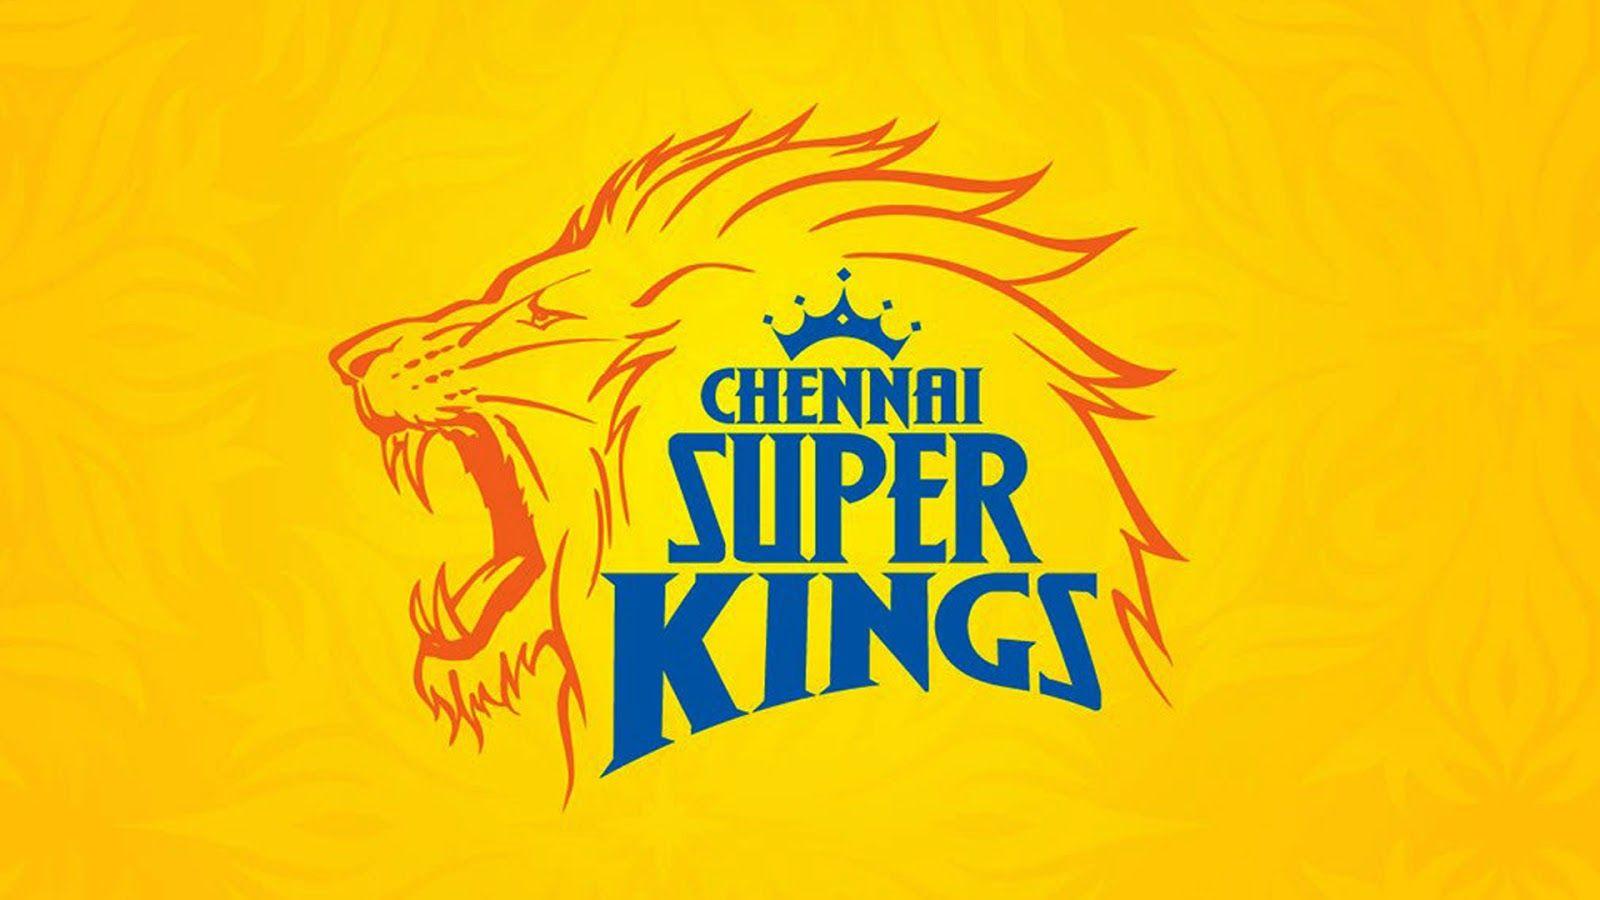 Chennai super kings logo clipart clipart freeuse library Chennai Super Kings HD Wallpapers Download Free 1080p | csk ... clipart freeuse library